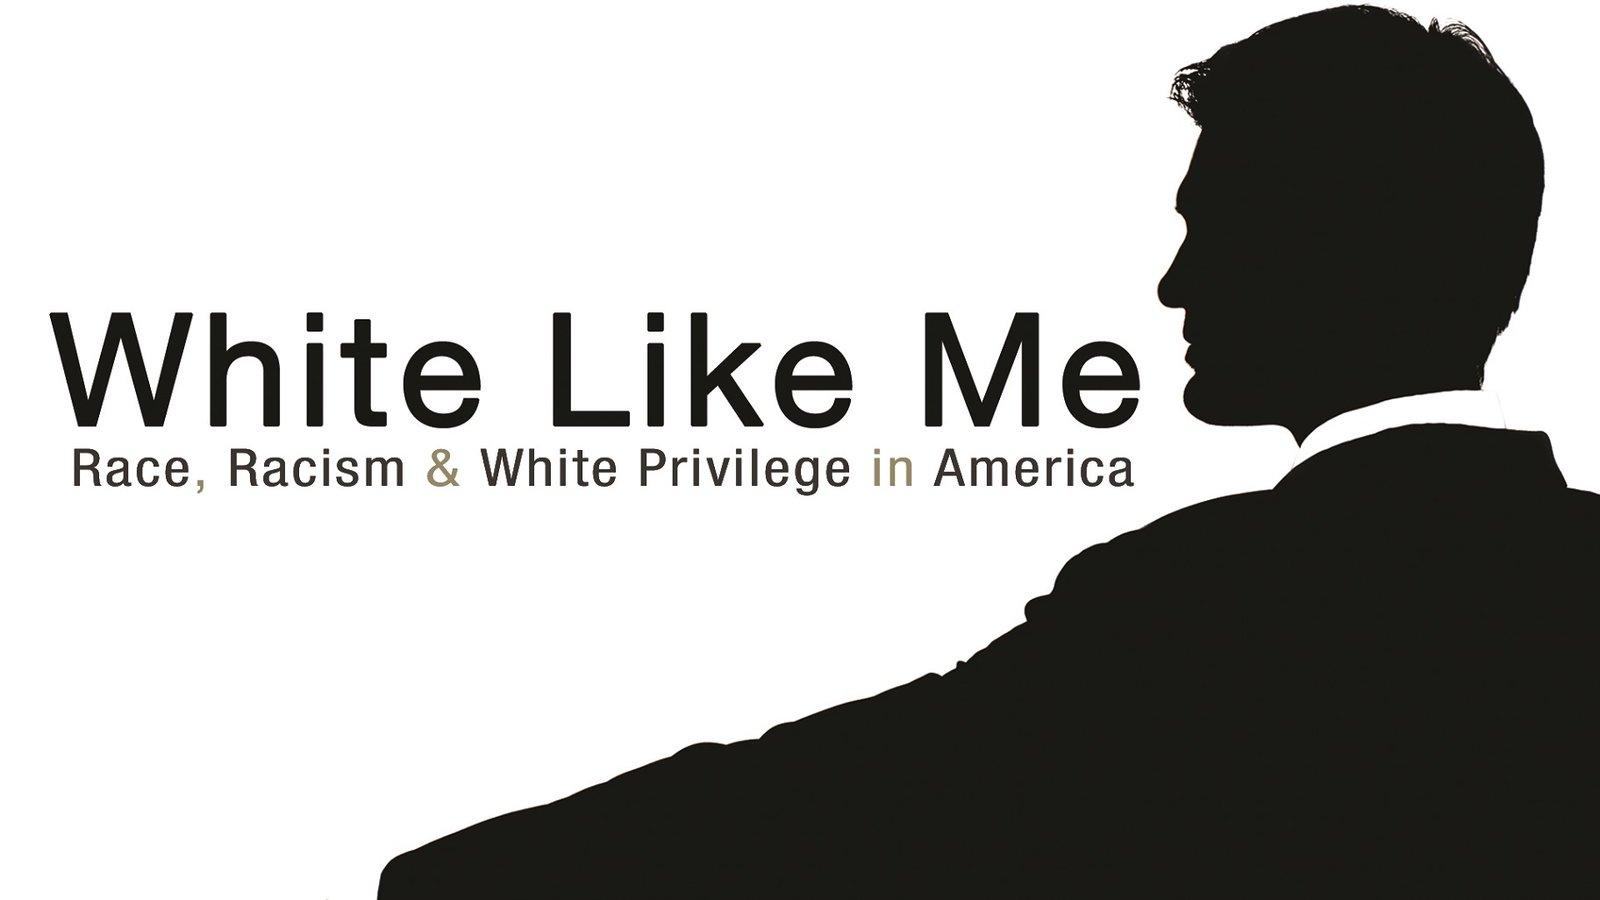 White Like Me - Race, Racism & White Privilege in America